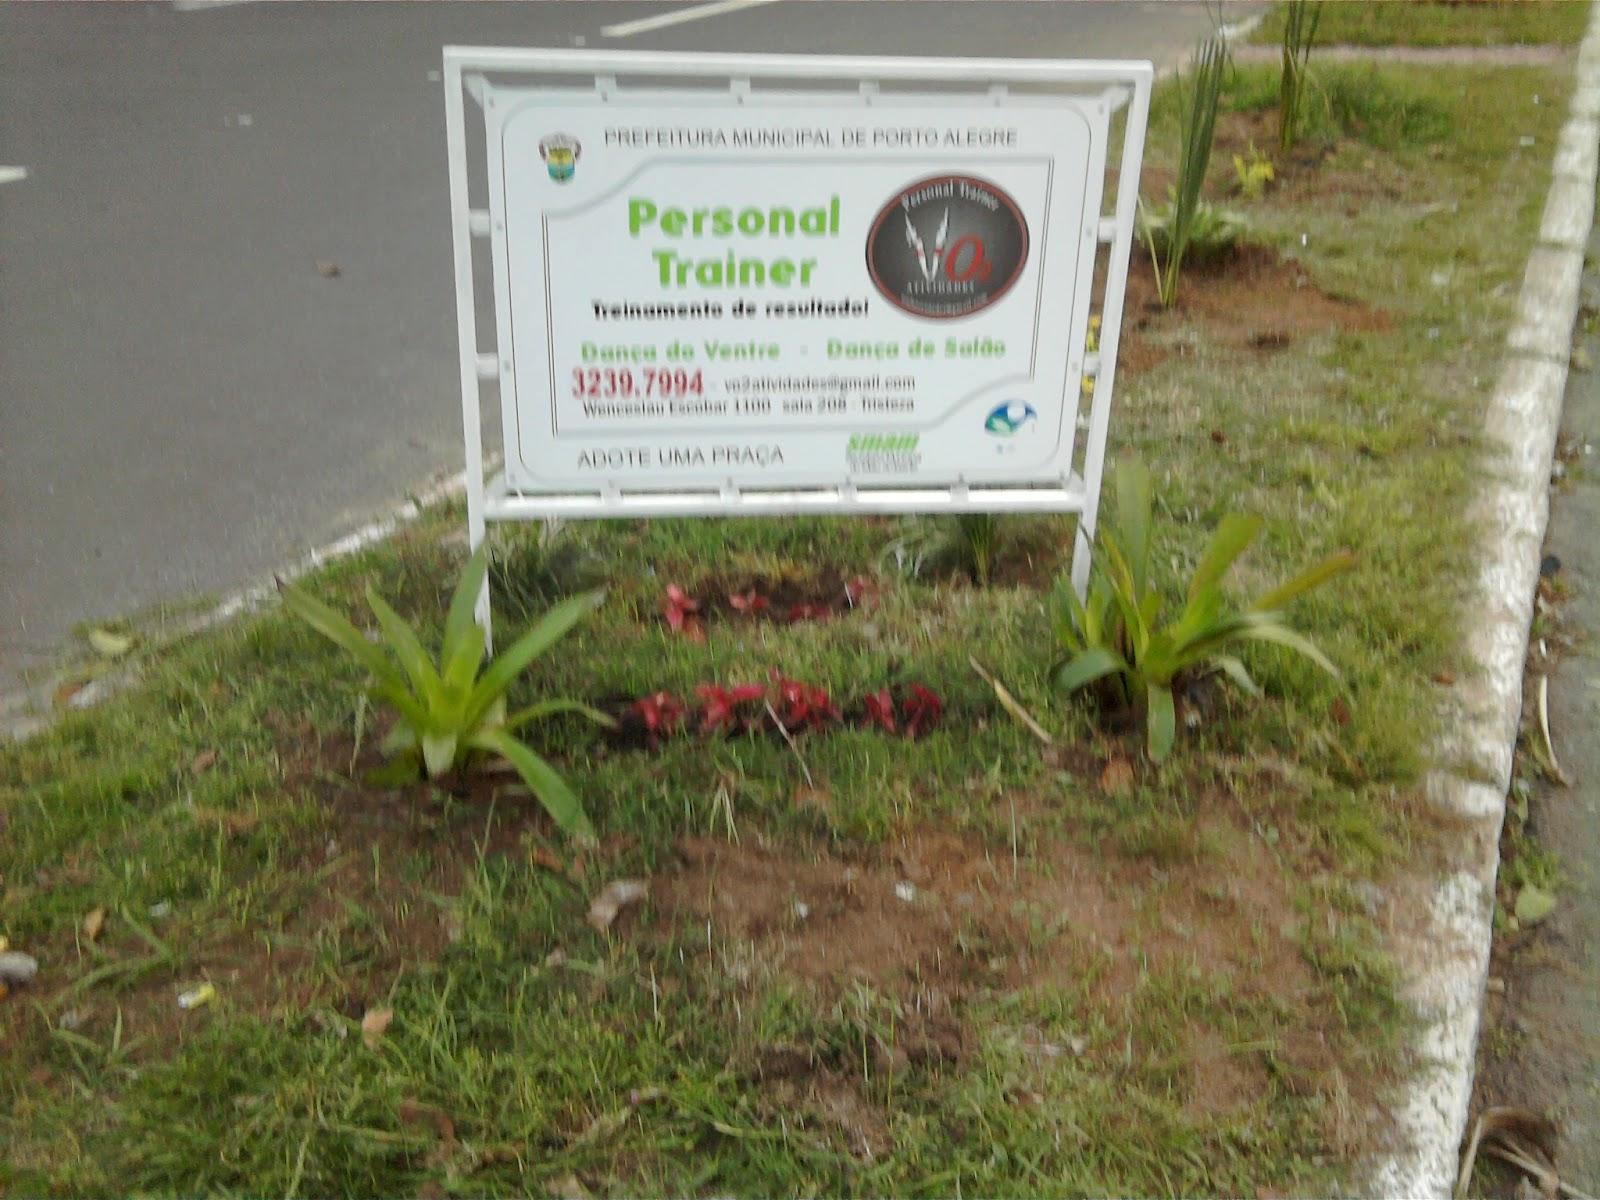 #649338 Personal Trainer Porto Alegre 3239 7994: Galeria de fotos 482 Janelas Duplas Porto